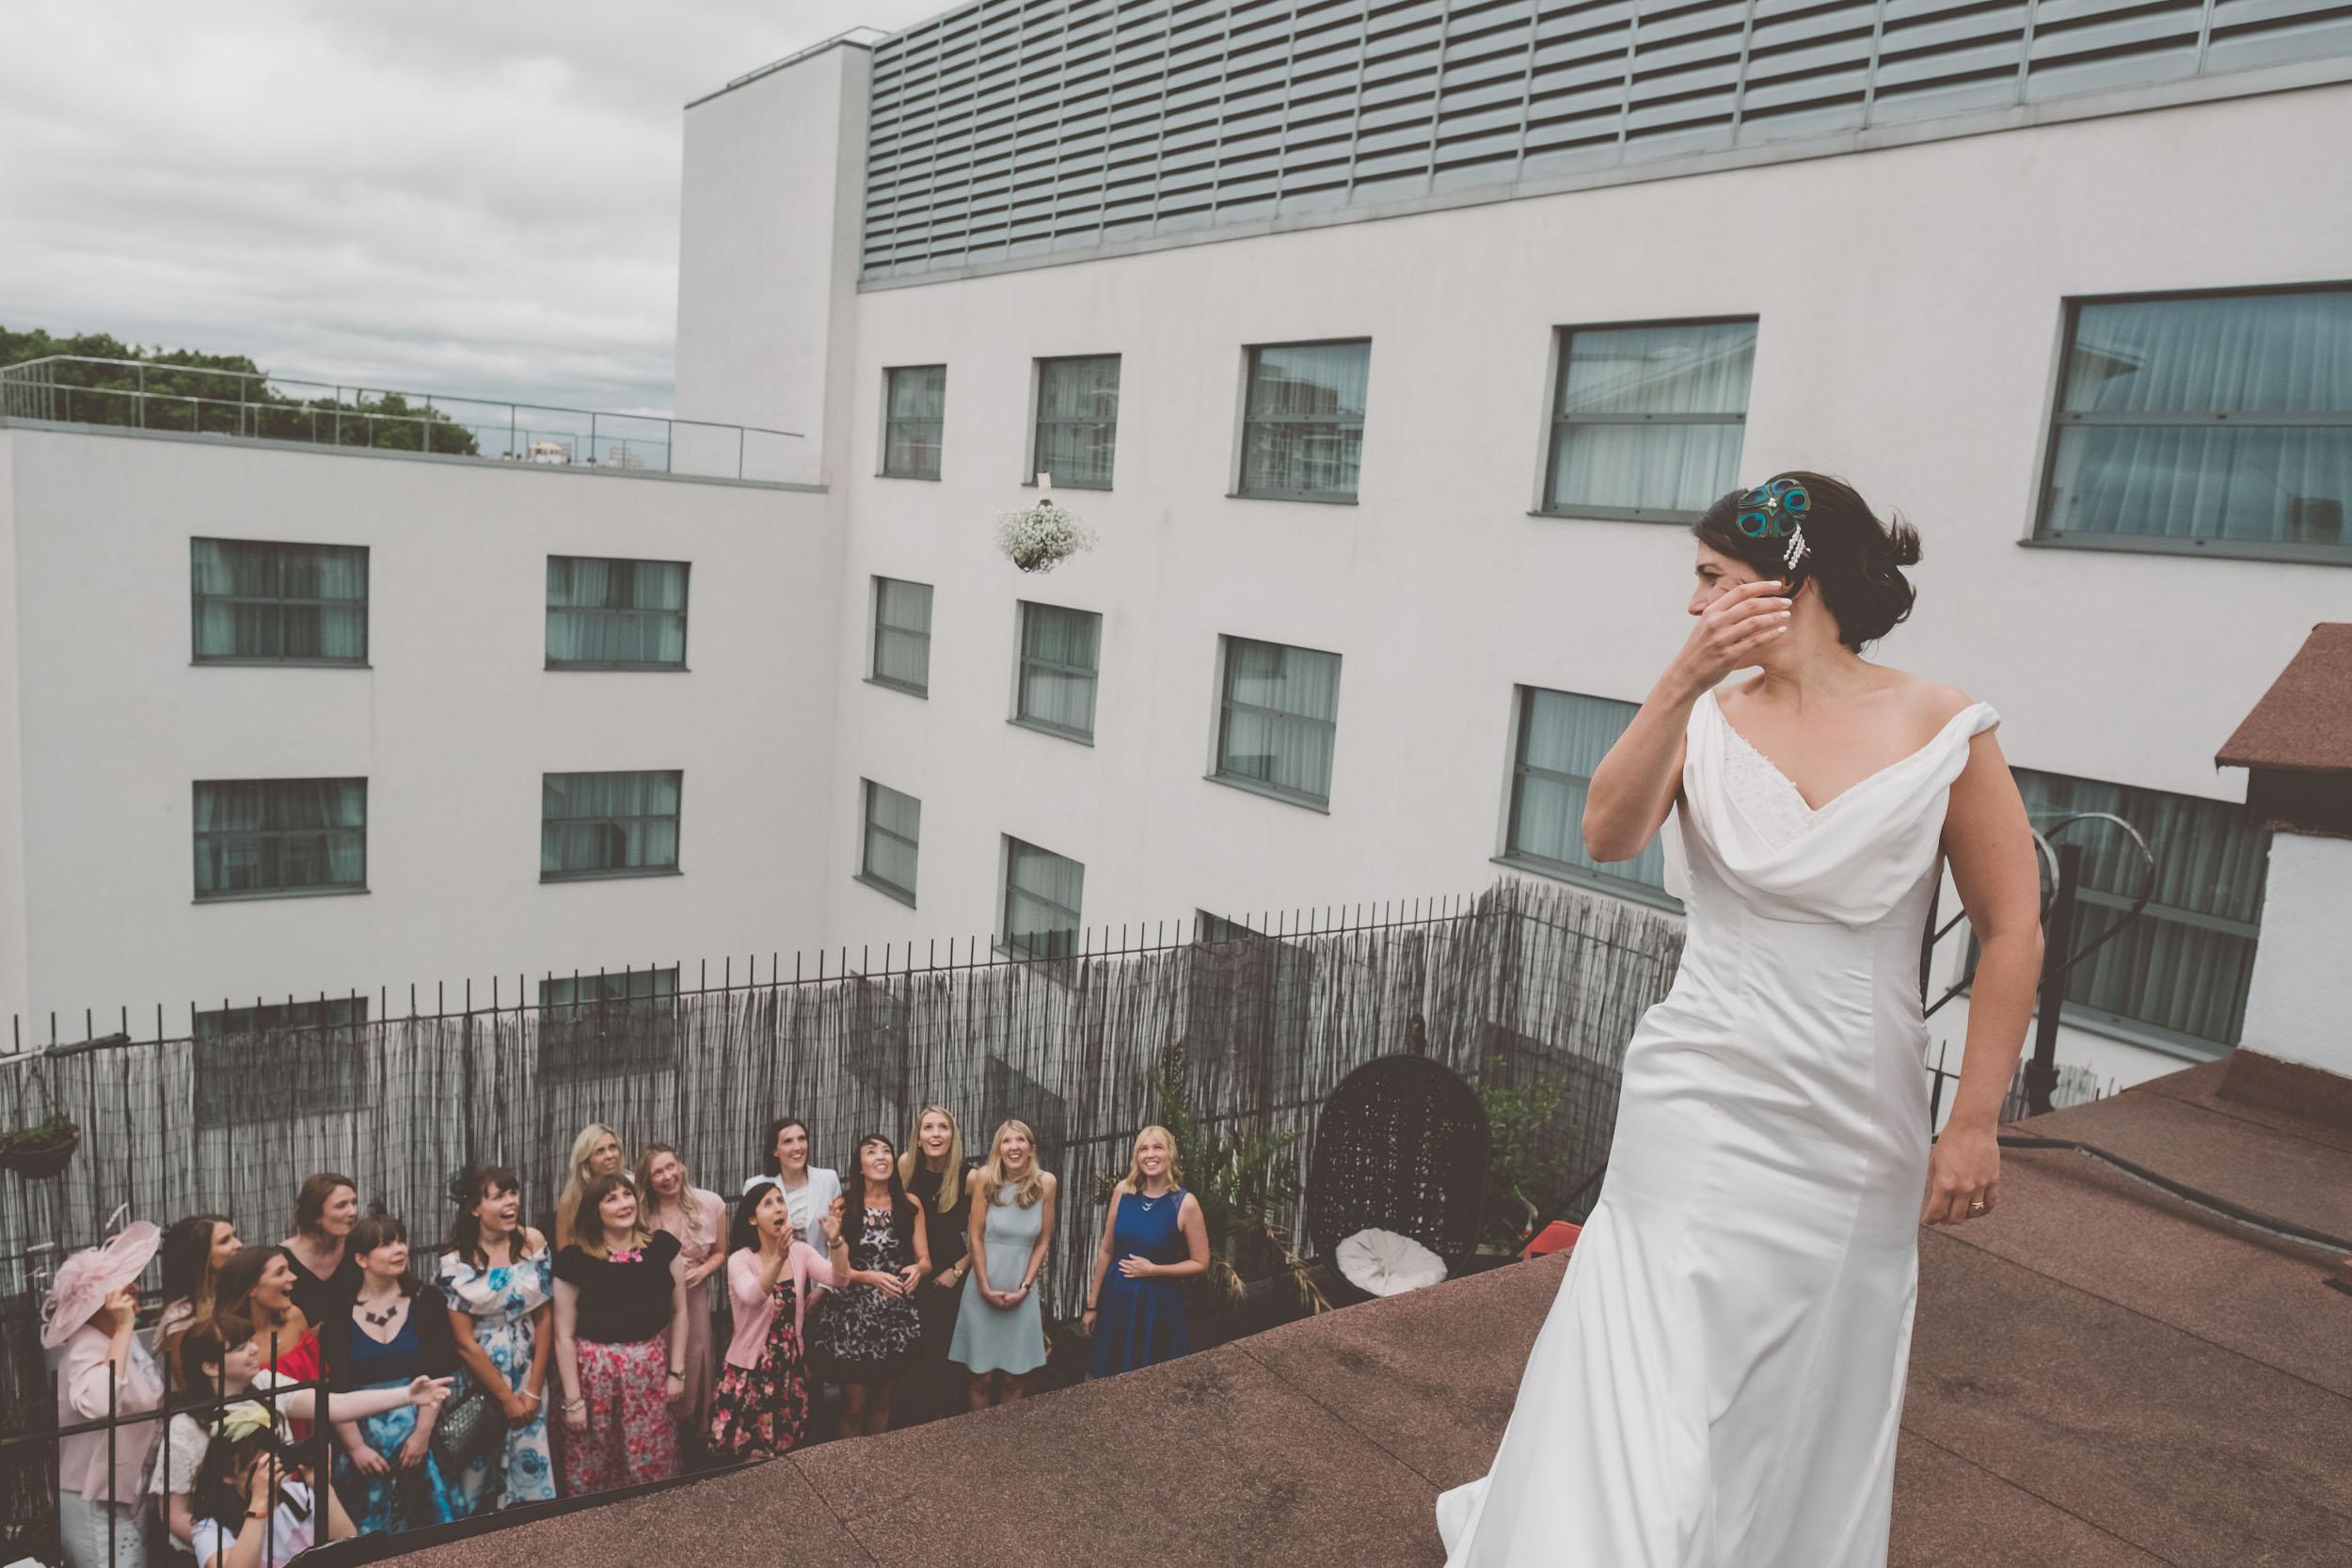 islington-town-hall-4th-floor-studios-wedding271.jpg